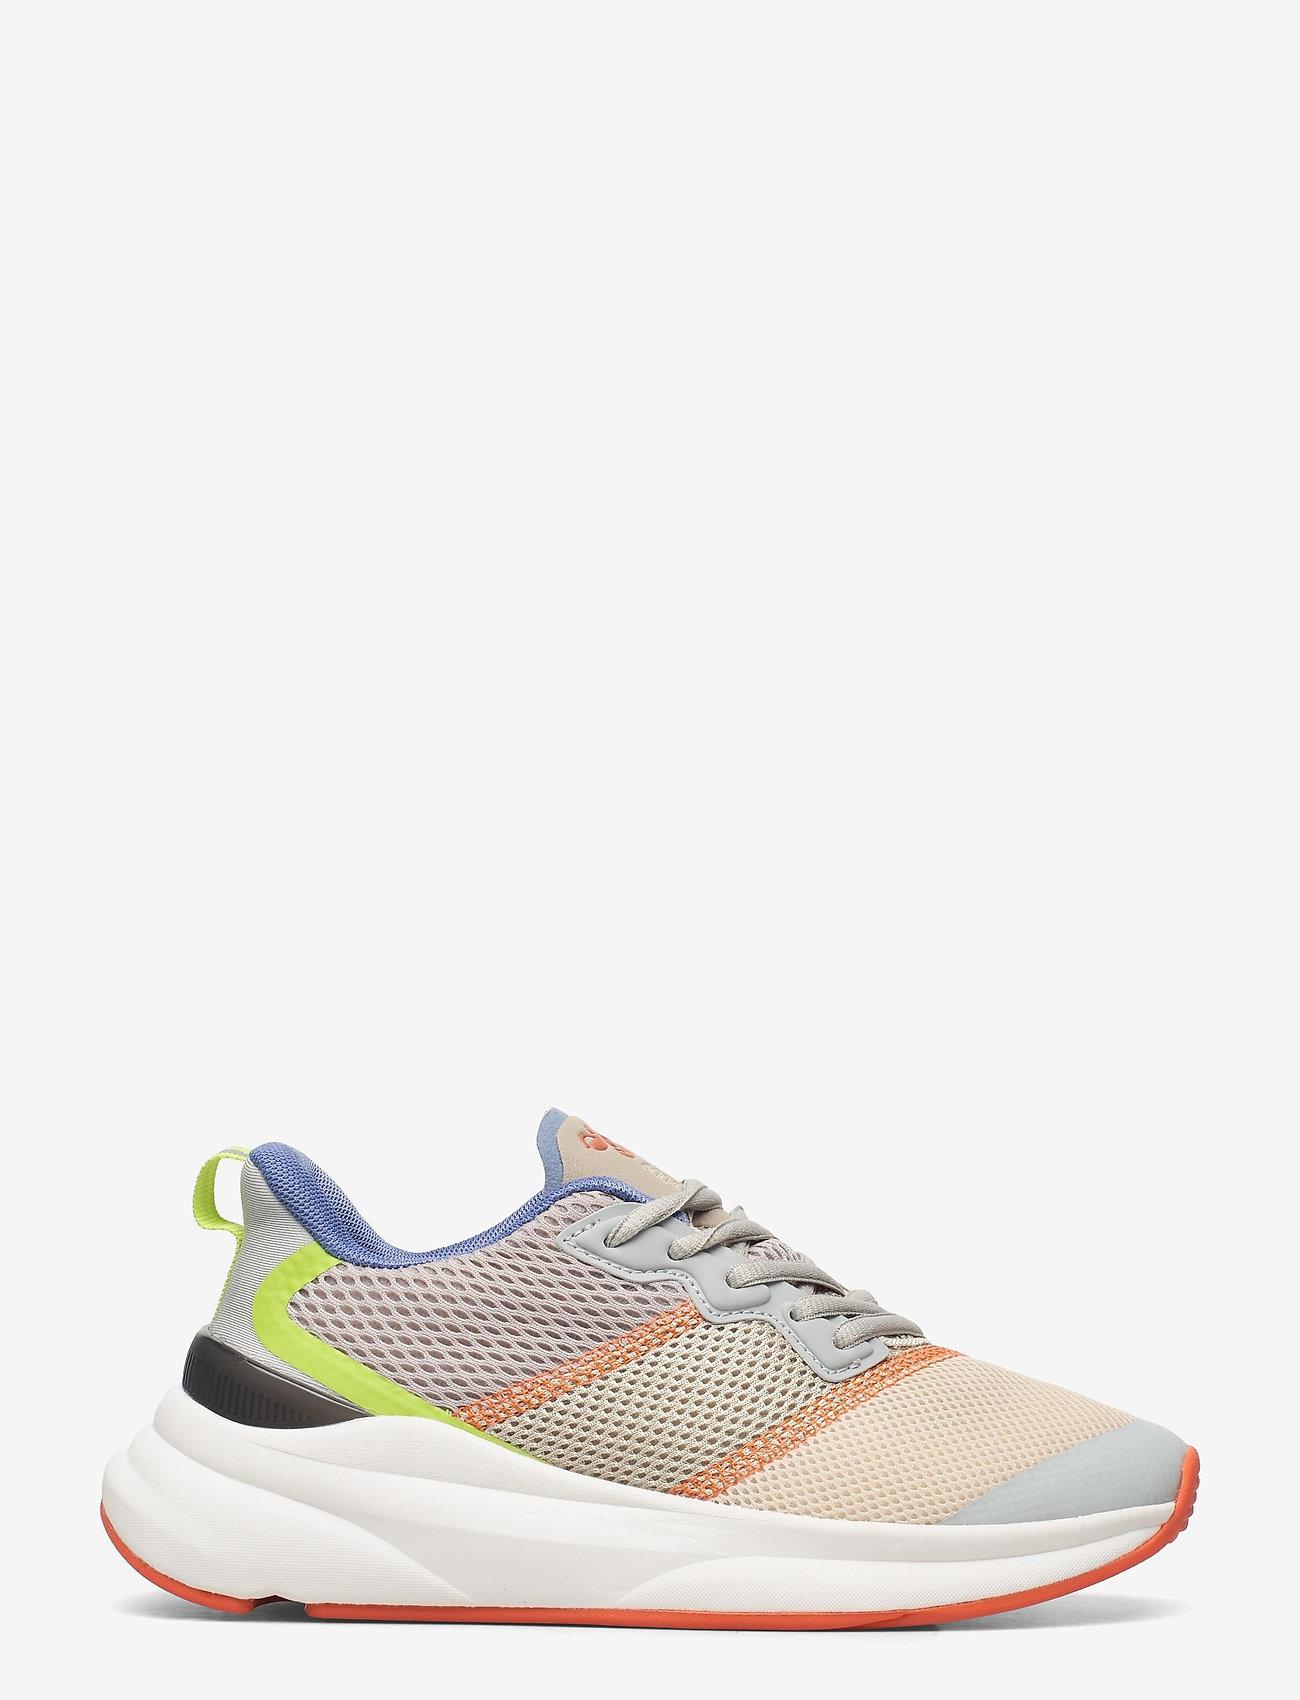 Hummel - REACH LX 600 - laag sneakers - marshmallow - 1